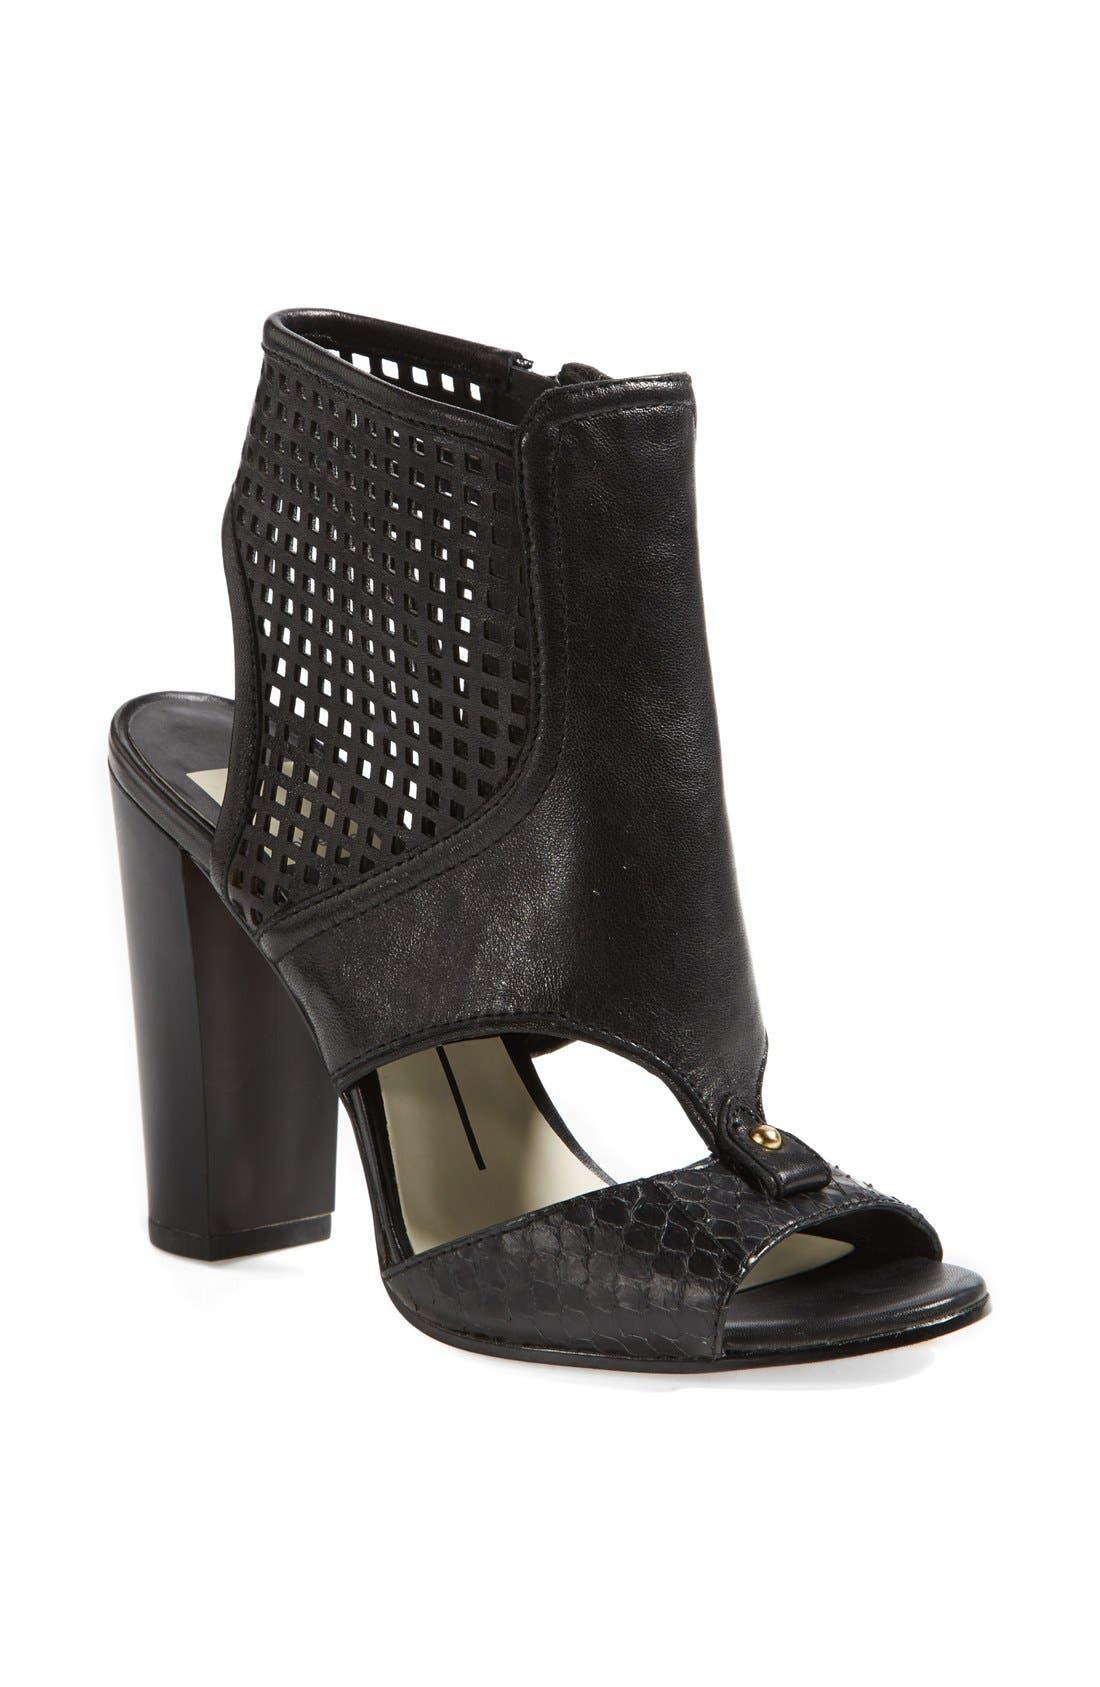 Main Image - Dolce Vita 'Nona' Sandal